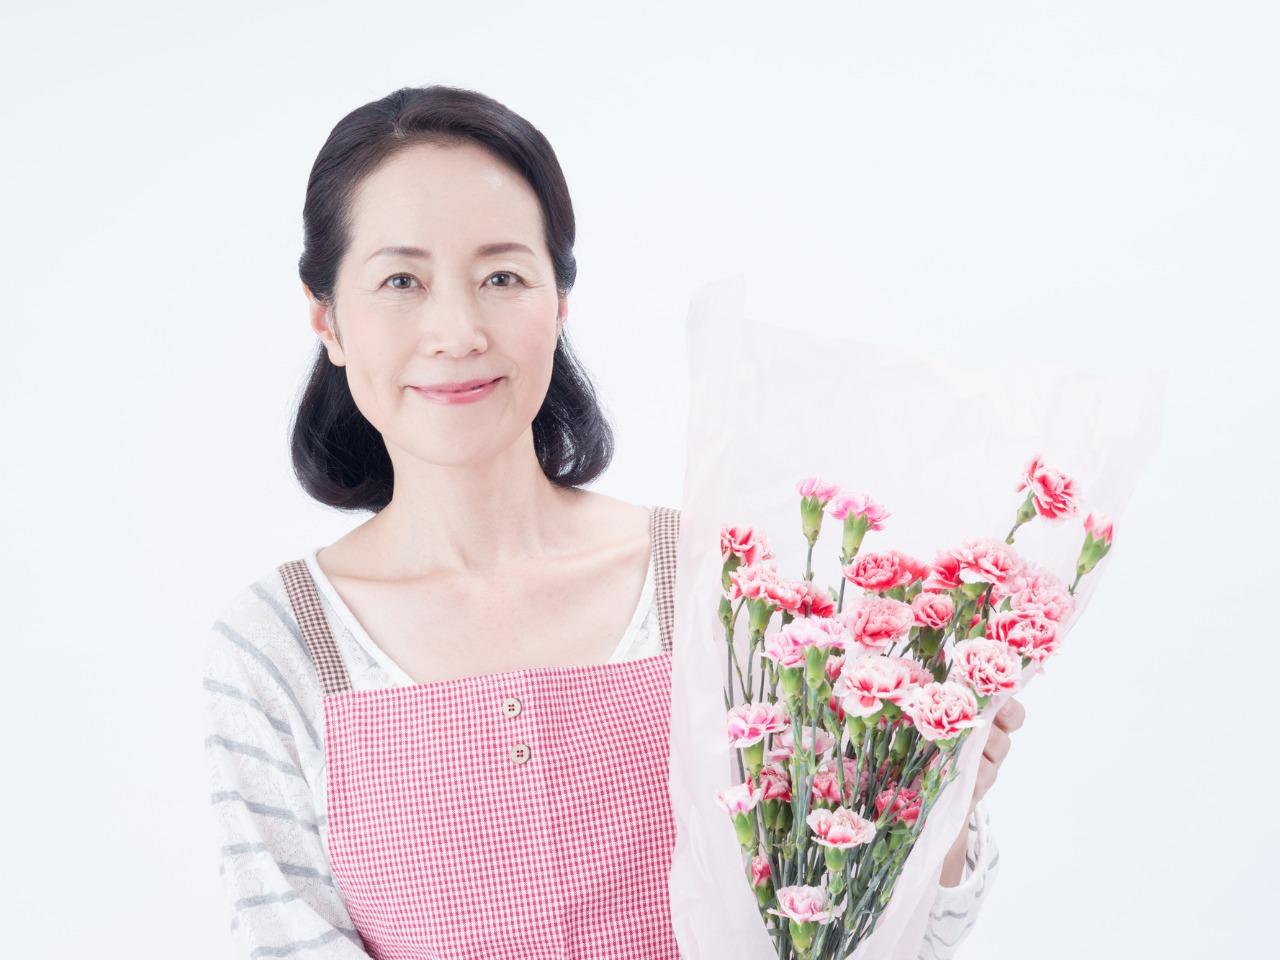 LINE占いで父の日・母の日のプレゼントなら東京渋谷で人気の占い館「婚活もできる占い館BCAFE(ビーカフェ)渋谷店」の占いチケットをお誕生日プレゼントにしては如何でしょうか。